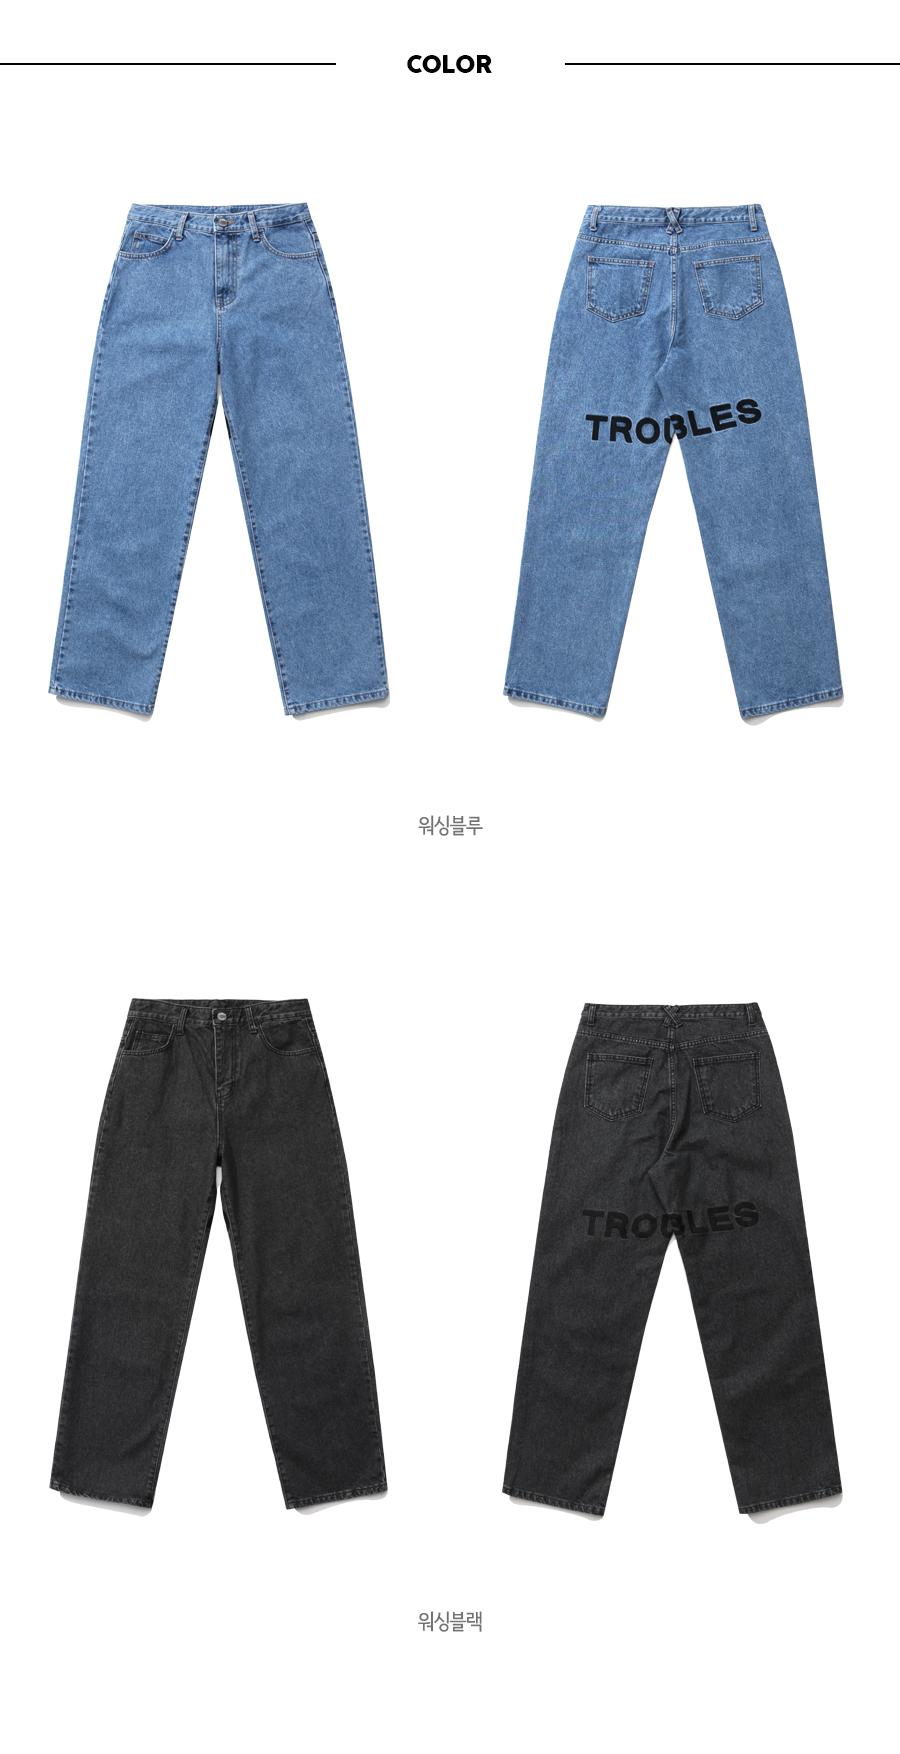 20180921_trouble_denim_pants_color_kj.jpg